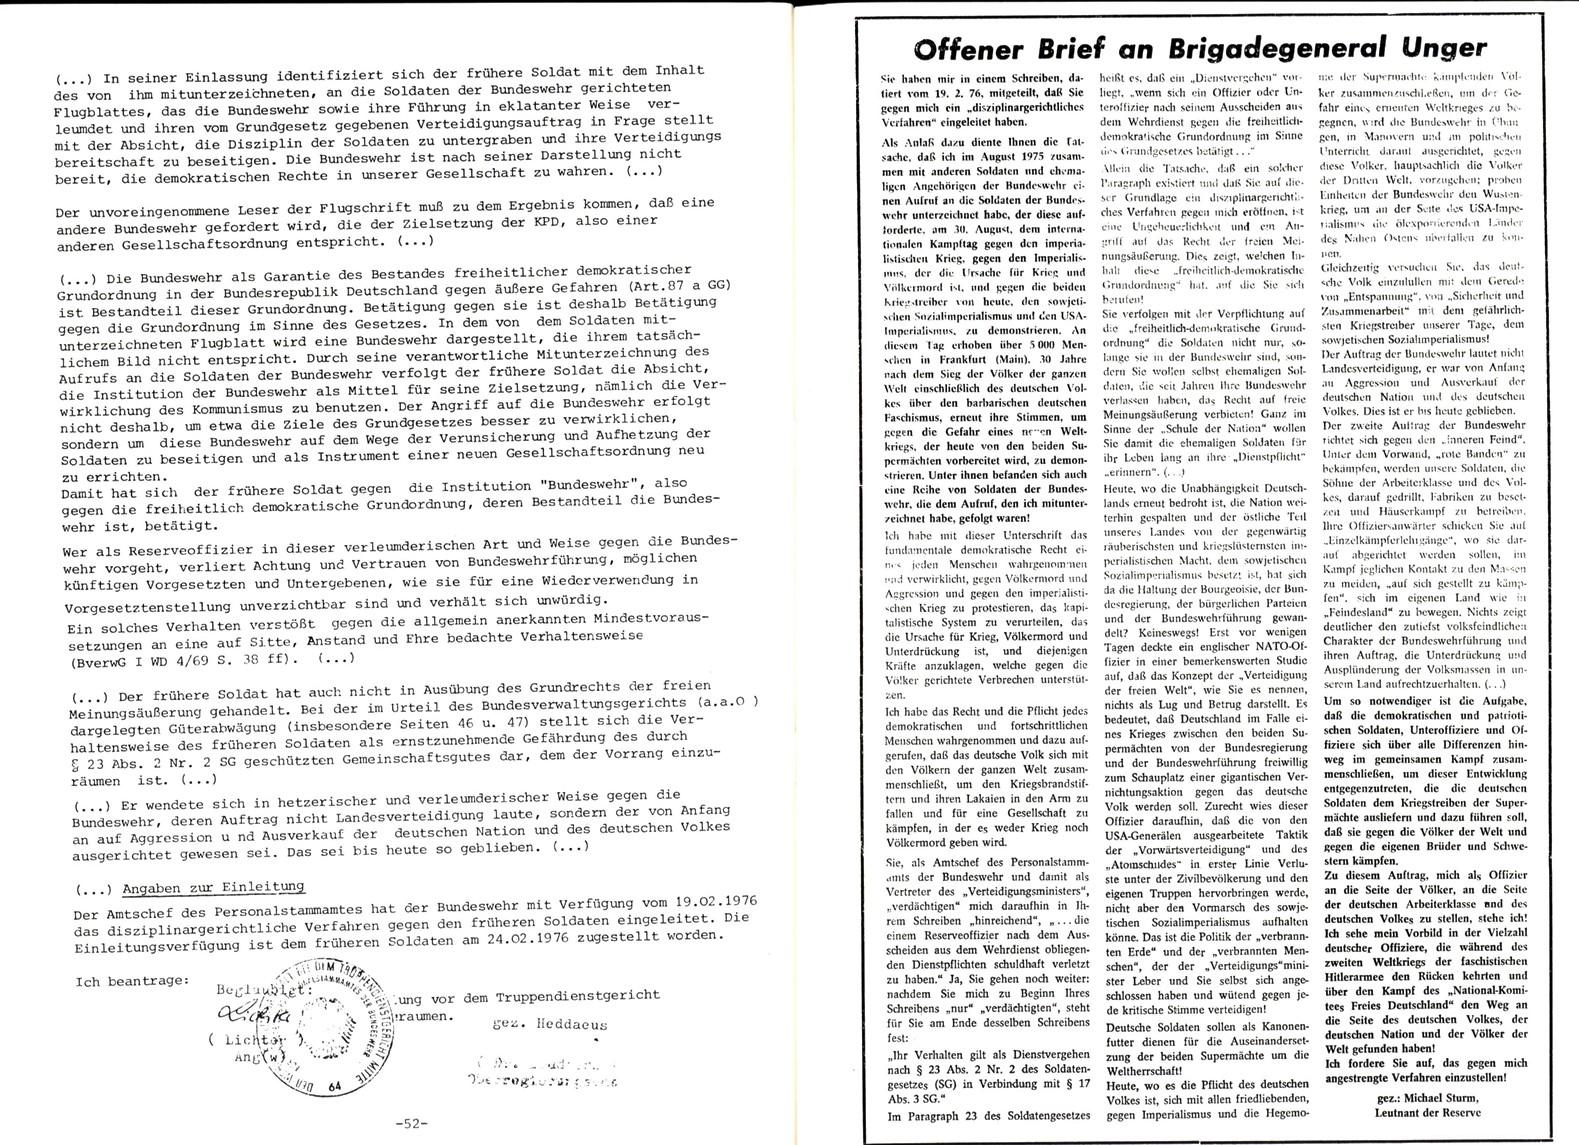 KPDAO_1976_Staatsschutzparagrafen_27